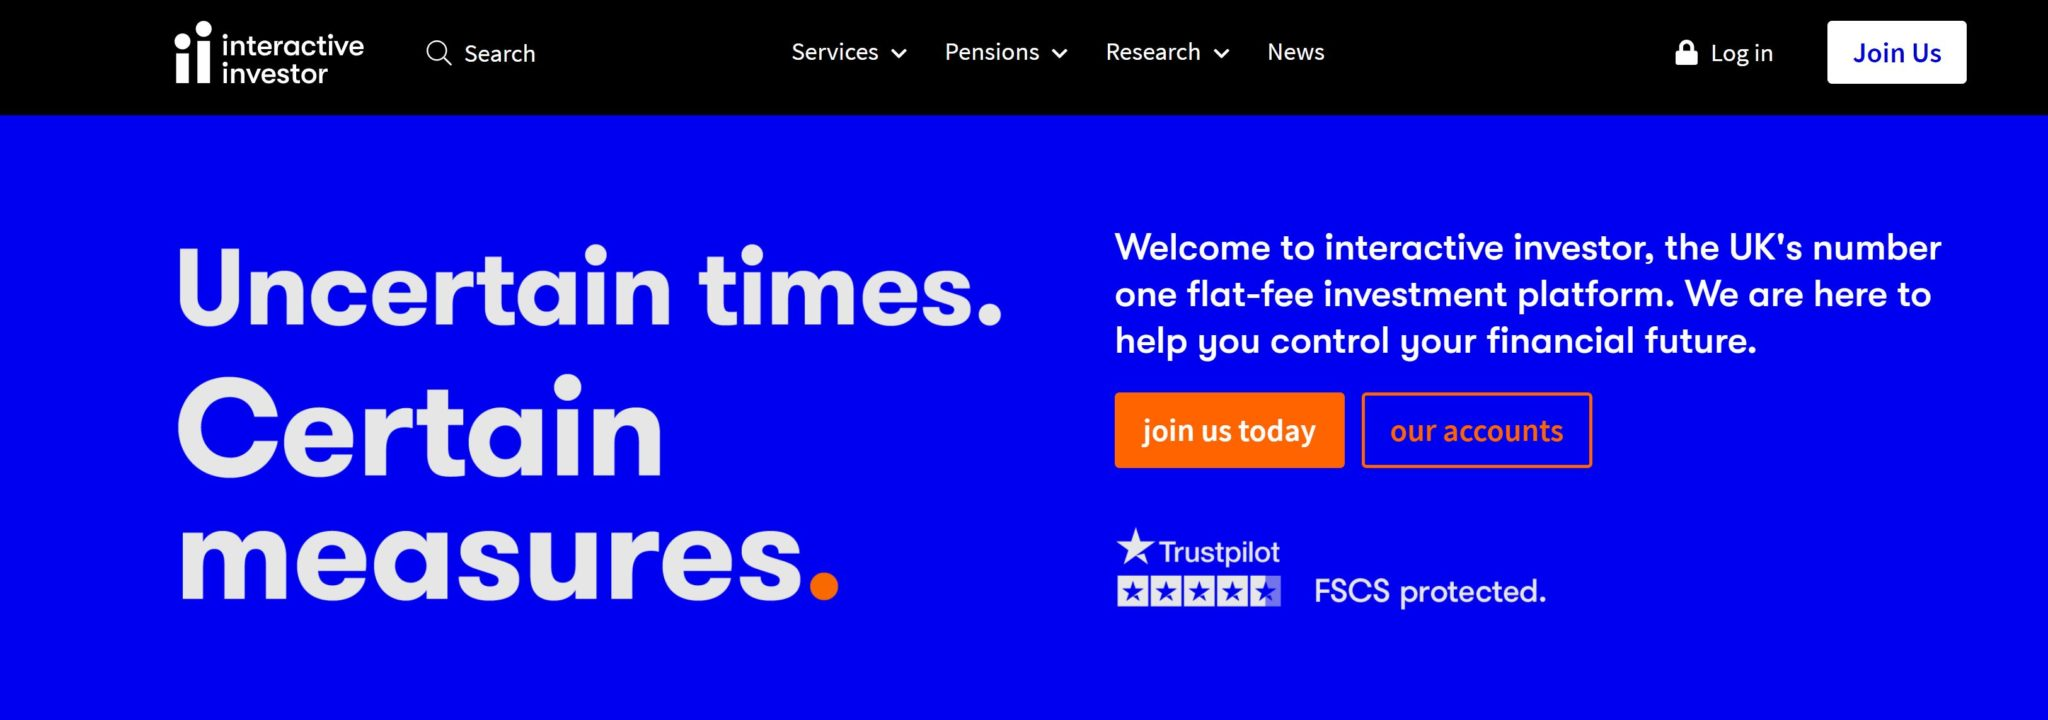 Interactive Investor homepage